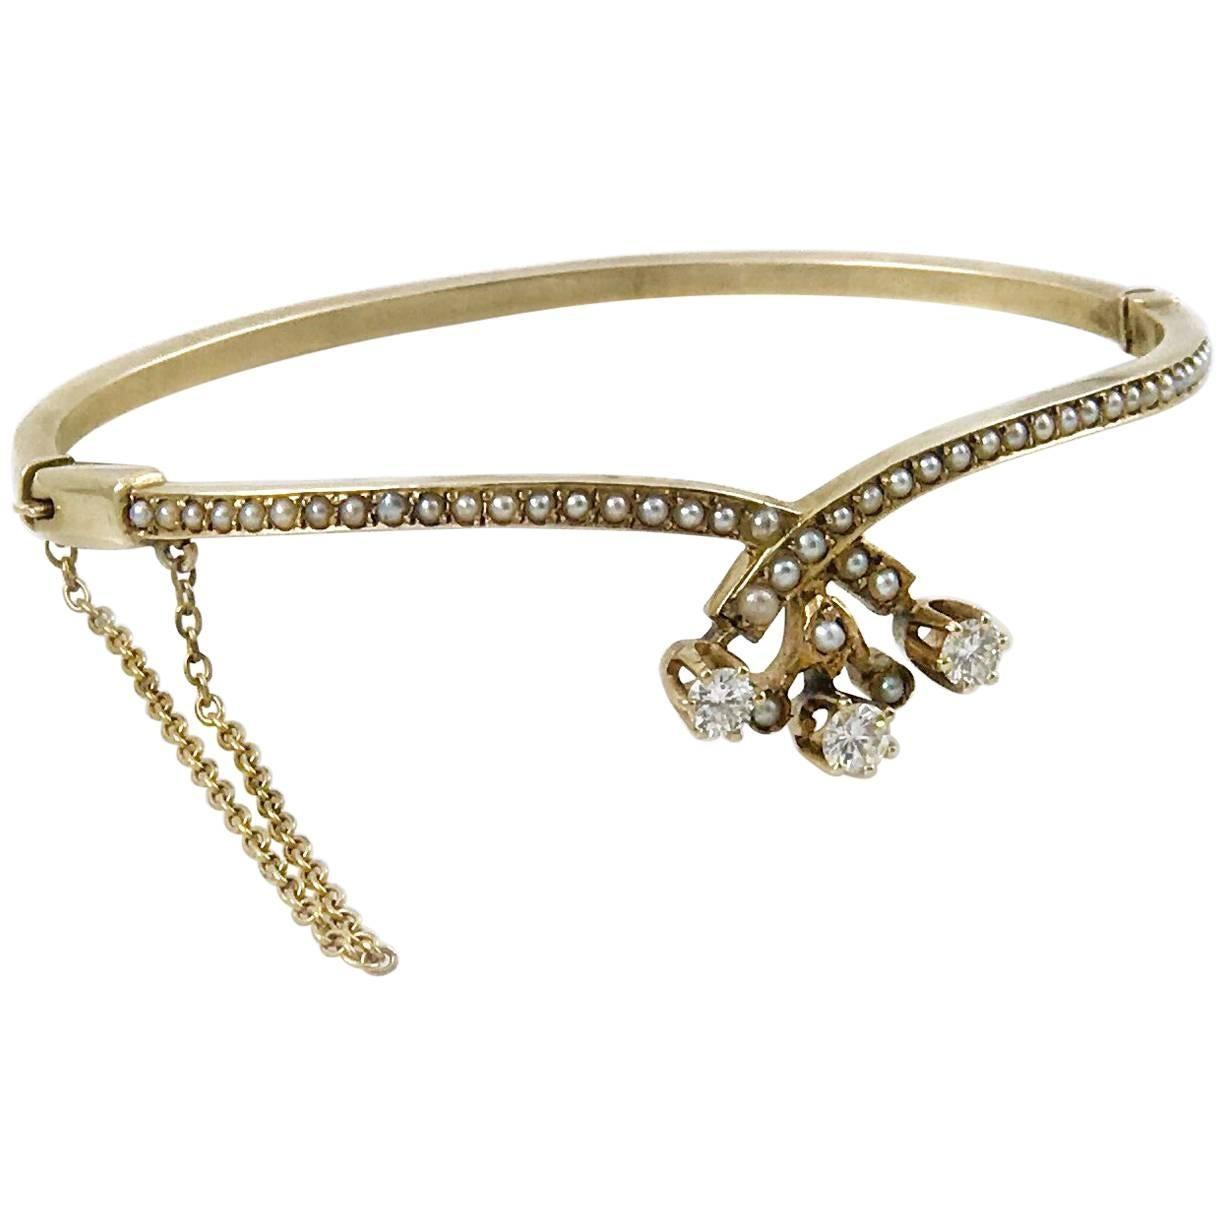 Victorian Diamond and Seed Pearl Bangle Bracelet, 0.51 Carat